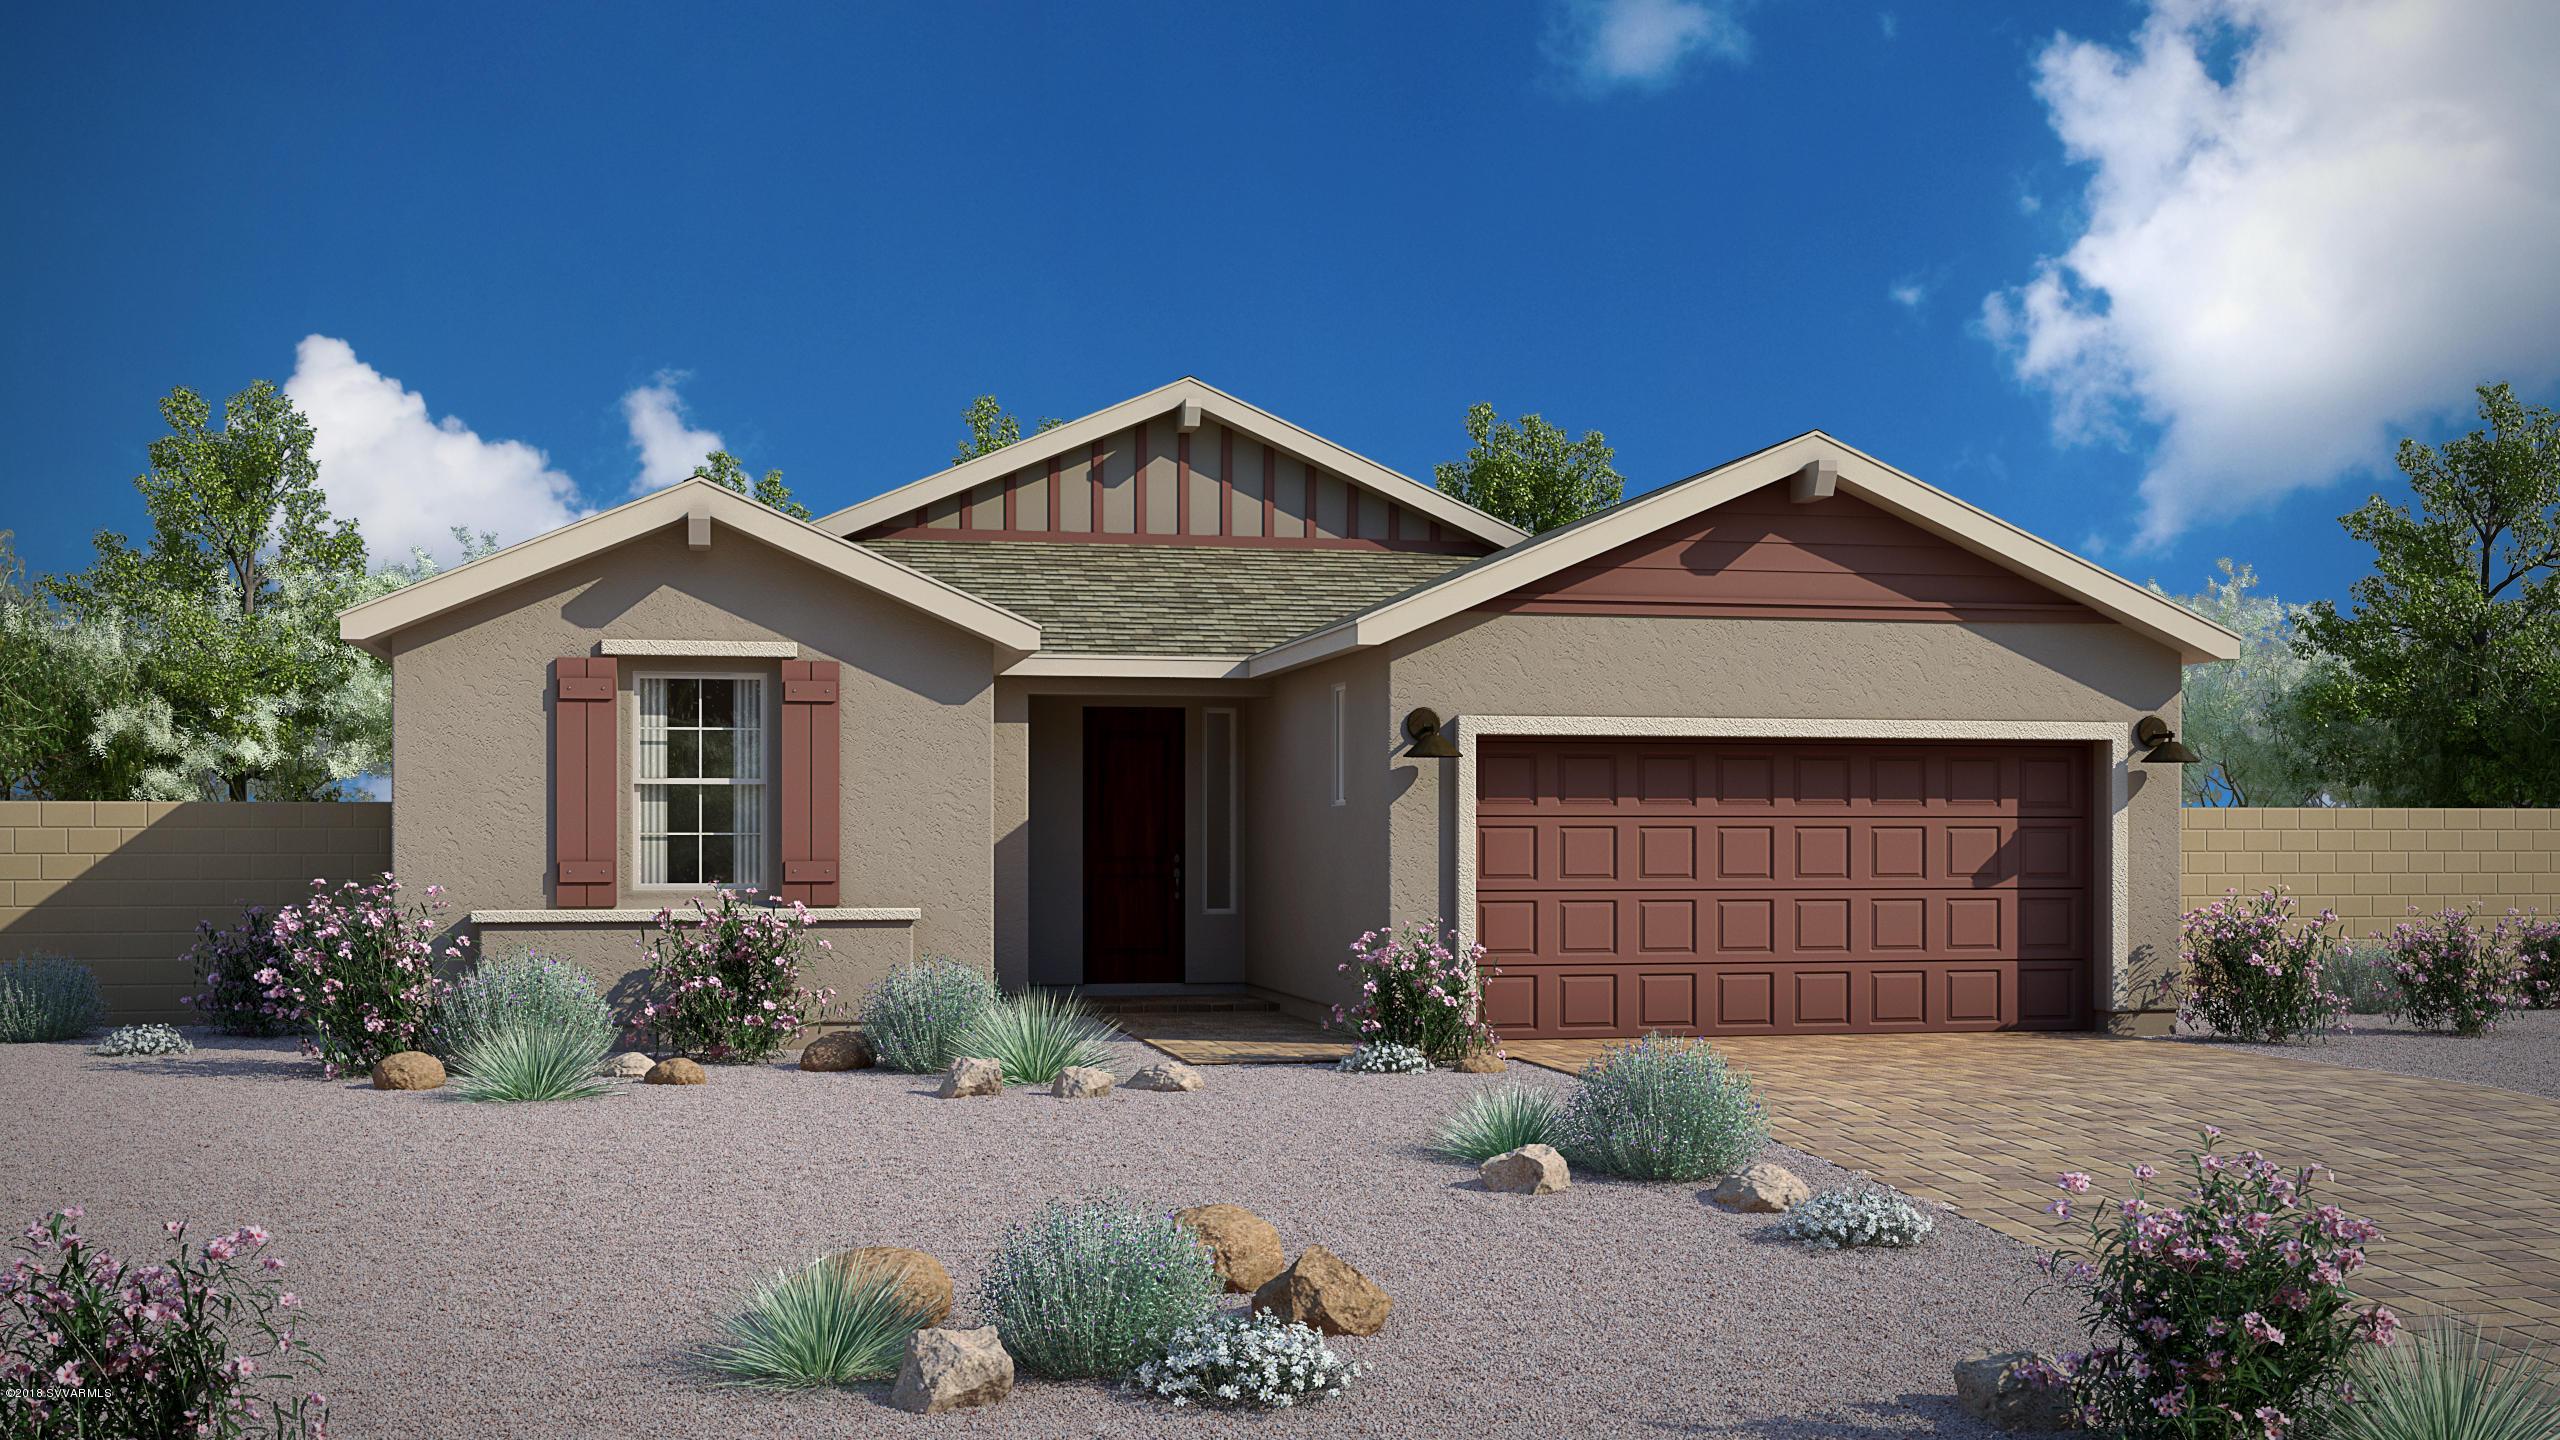 262 Whistle Stop Rd Clarkdale, AZ 86324